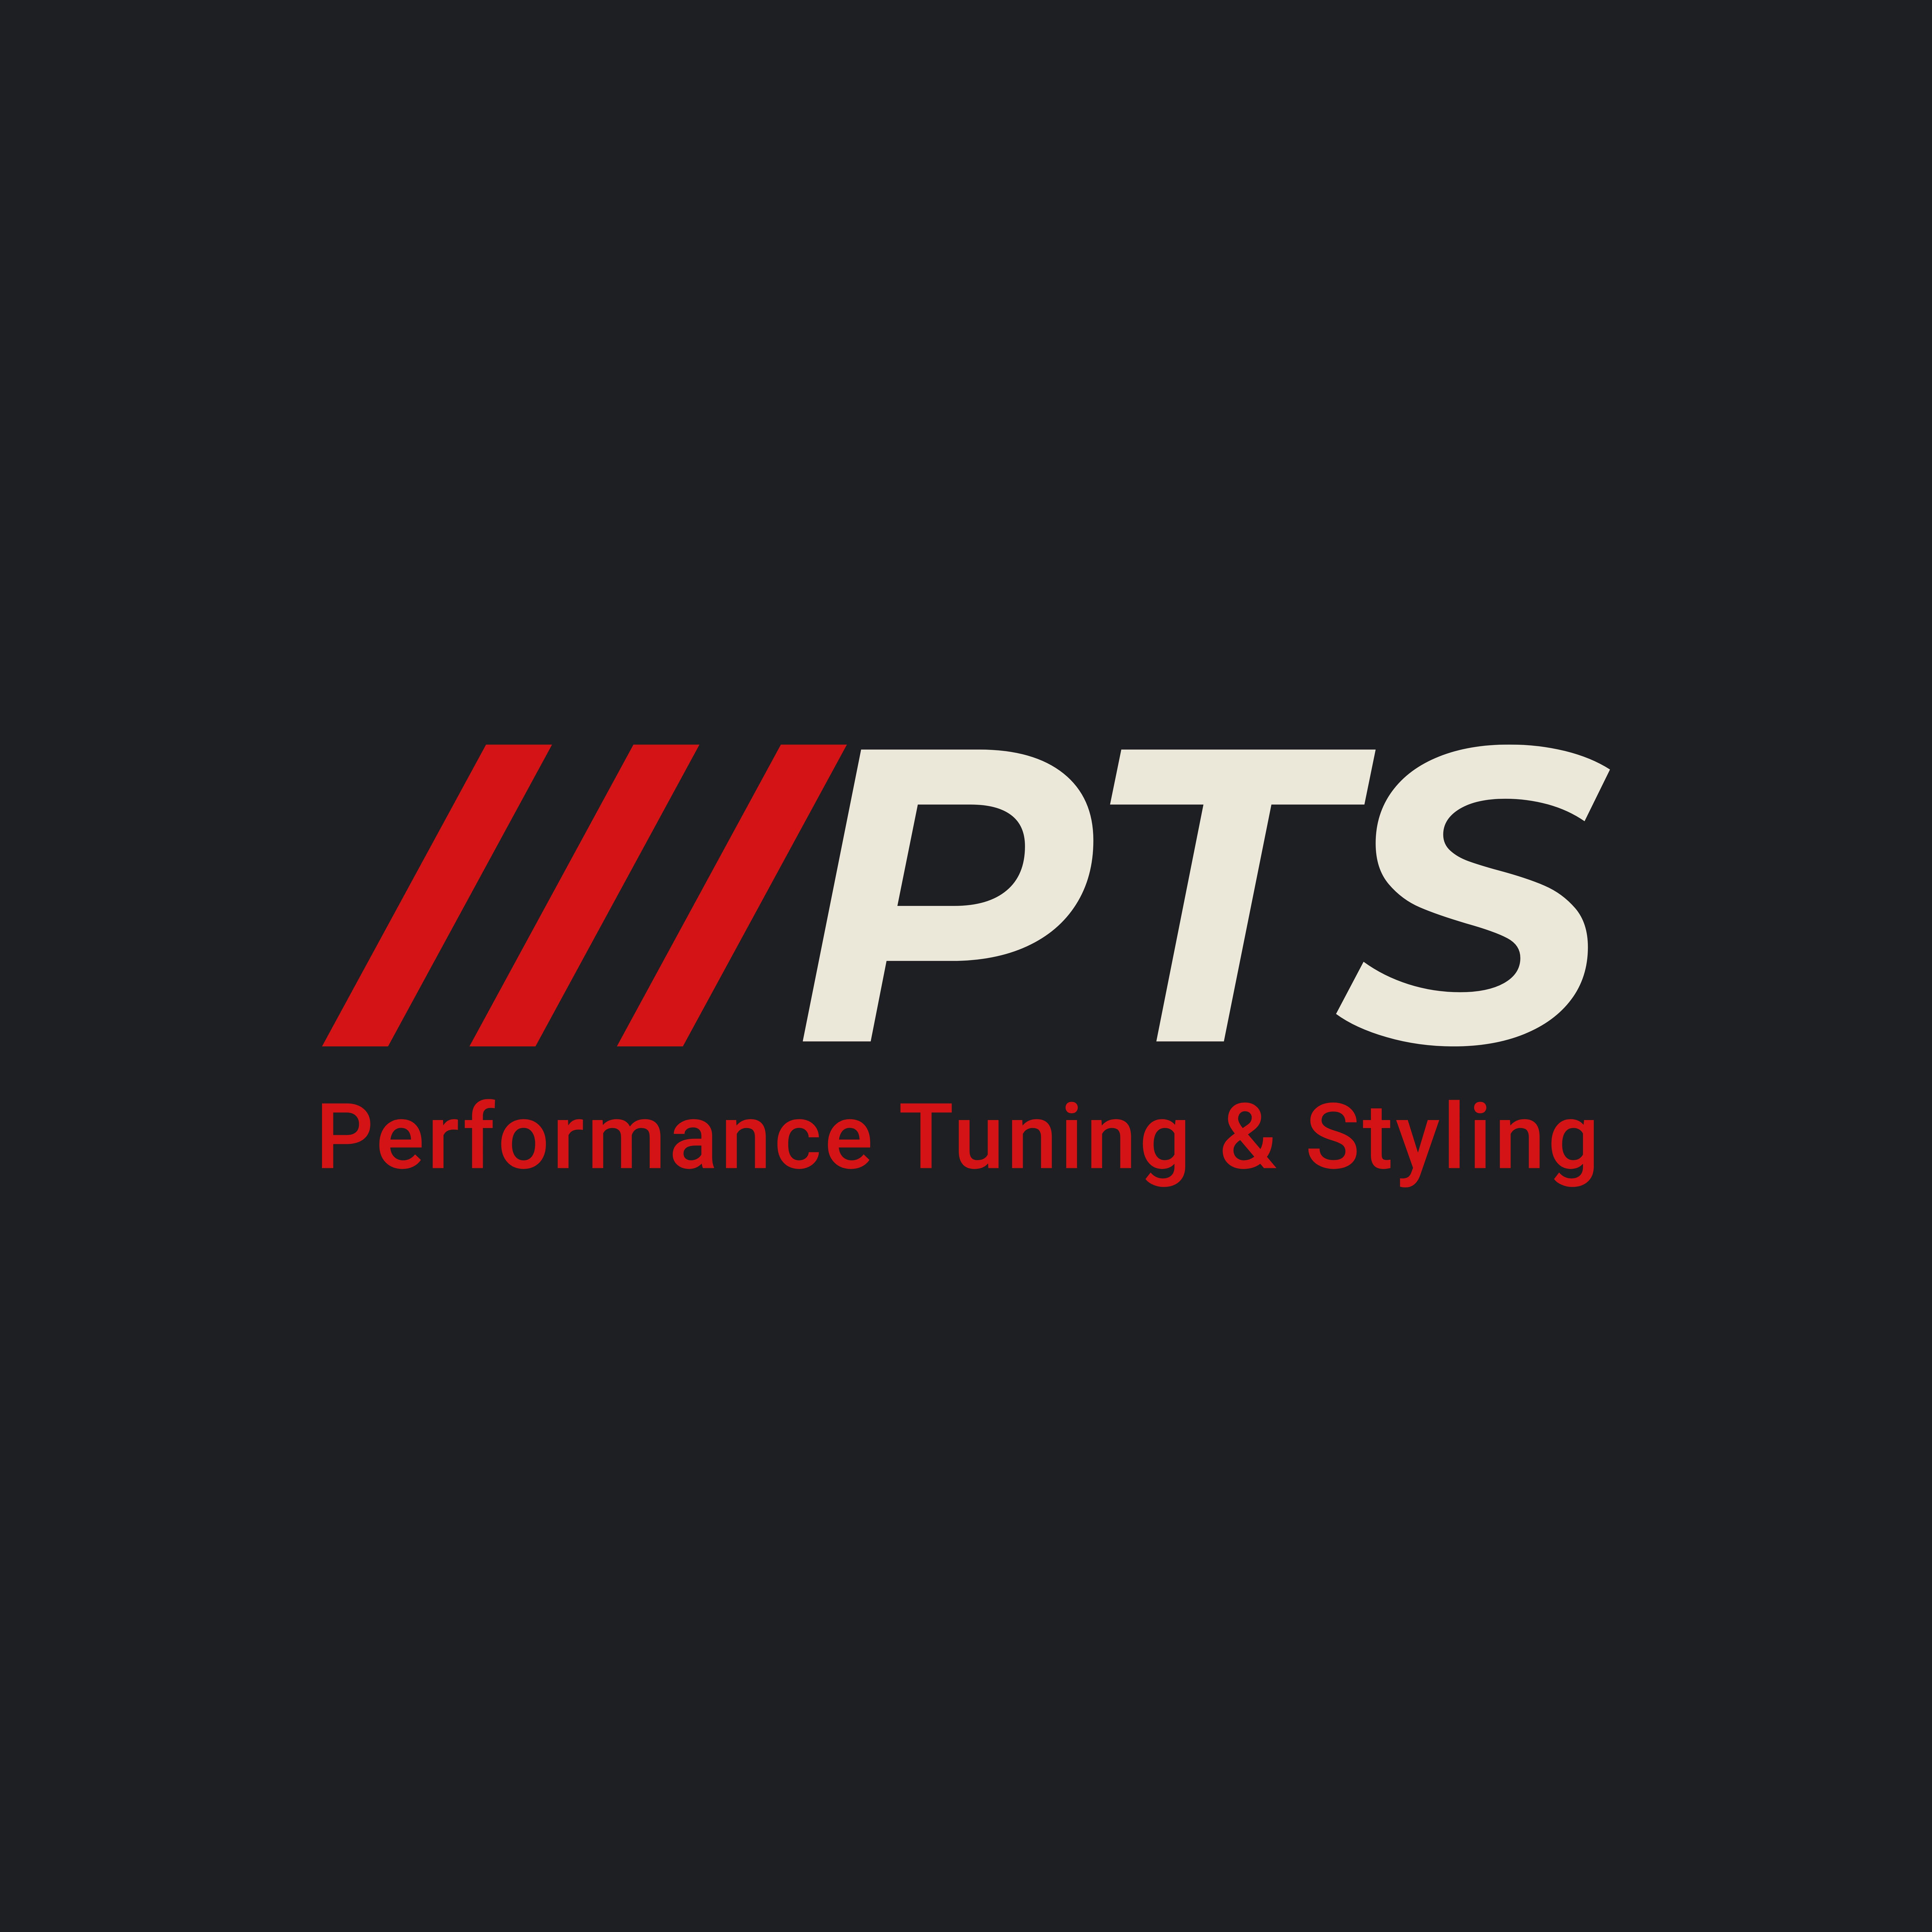 Performance Tuning & Styling logo